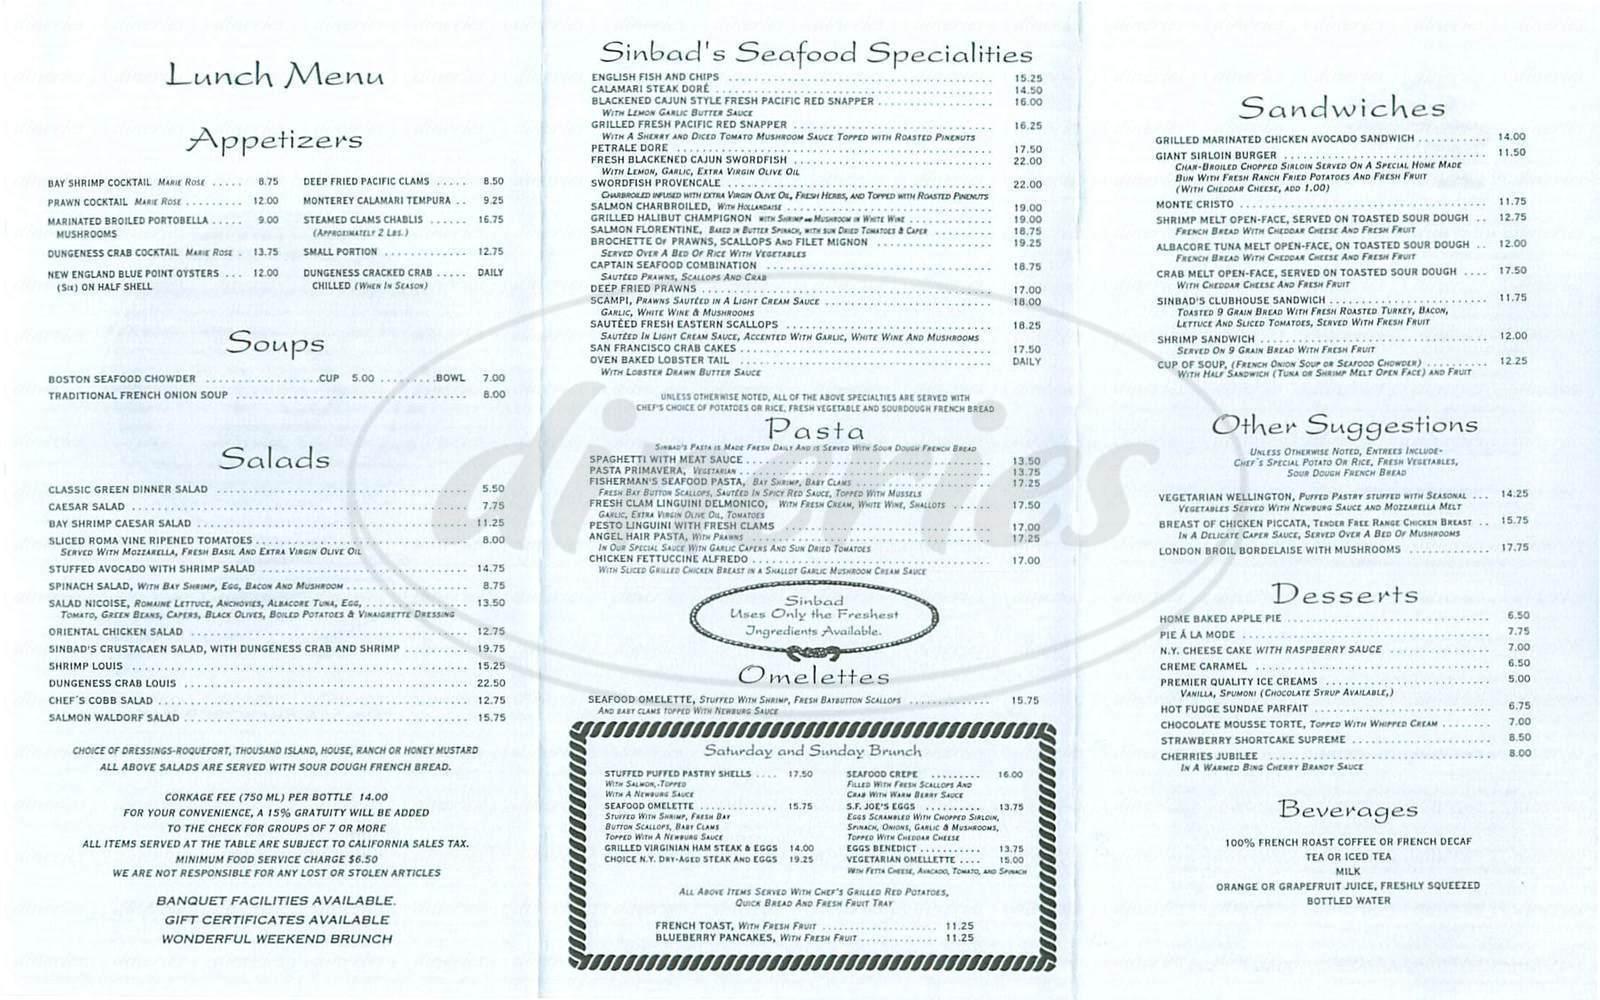 menu for Sinbad's